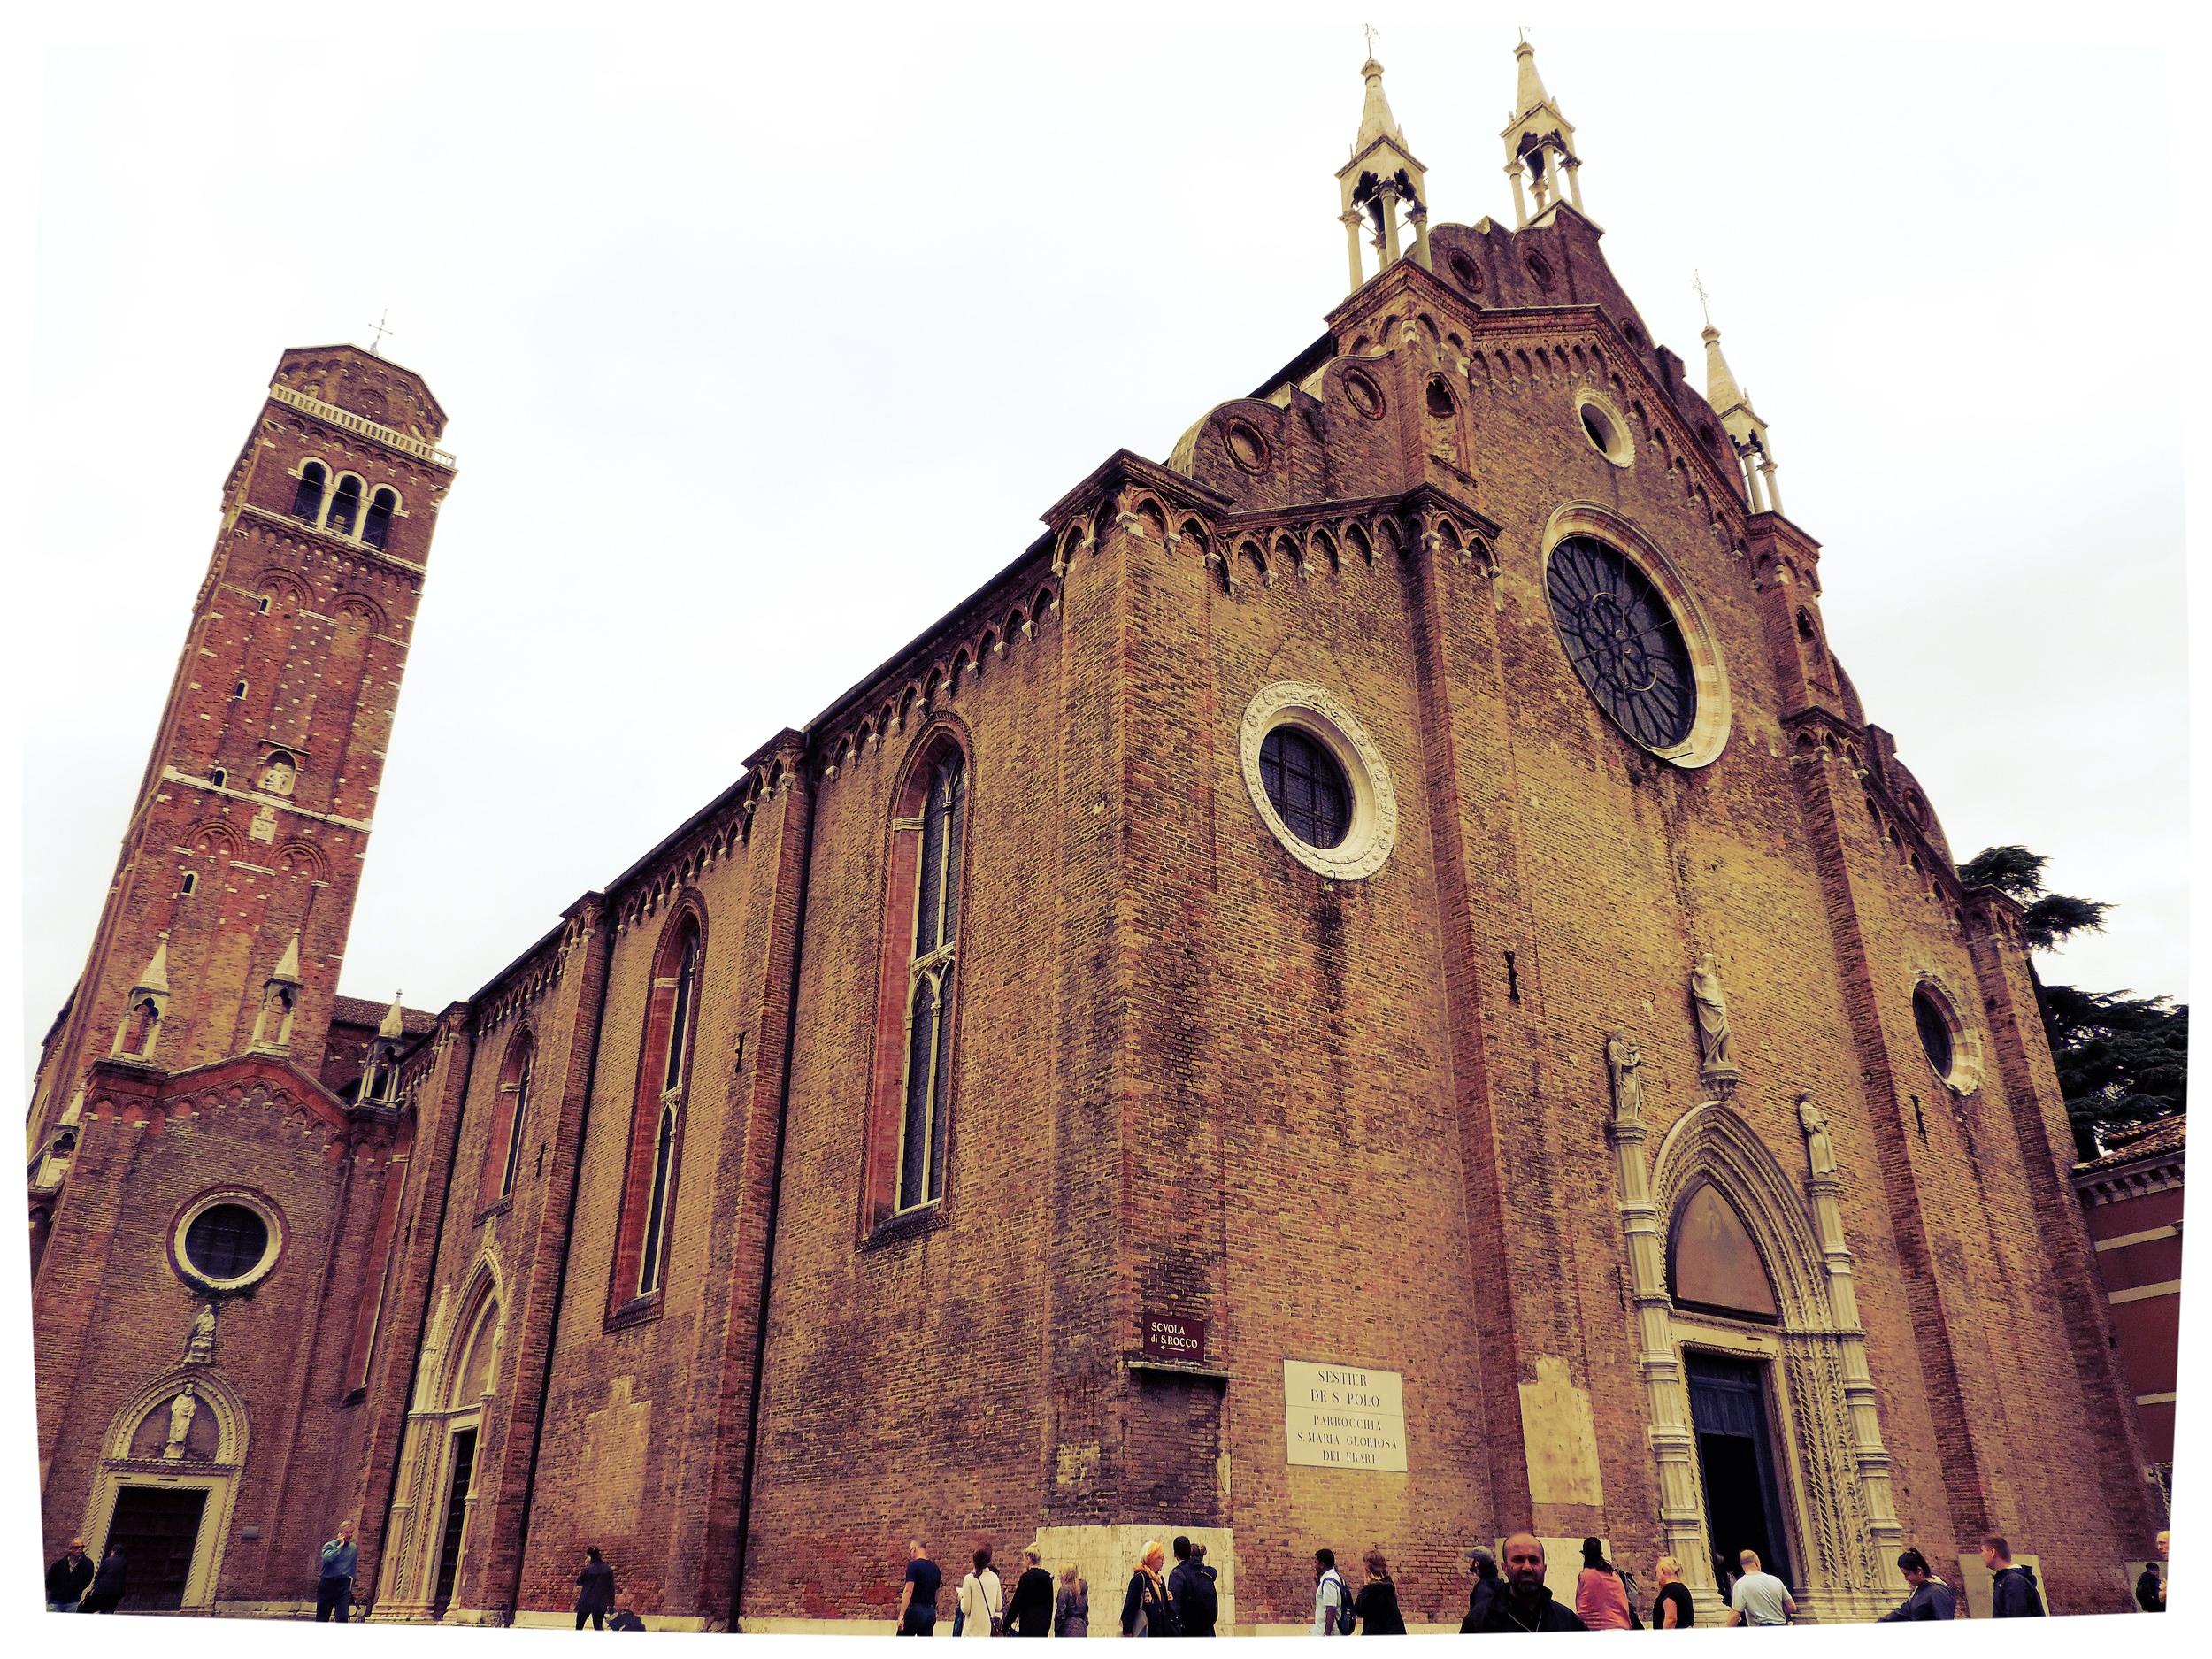 Santa Maria Gloriosa del Frari - San Polo